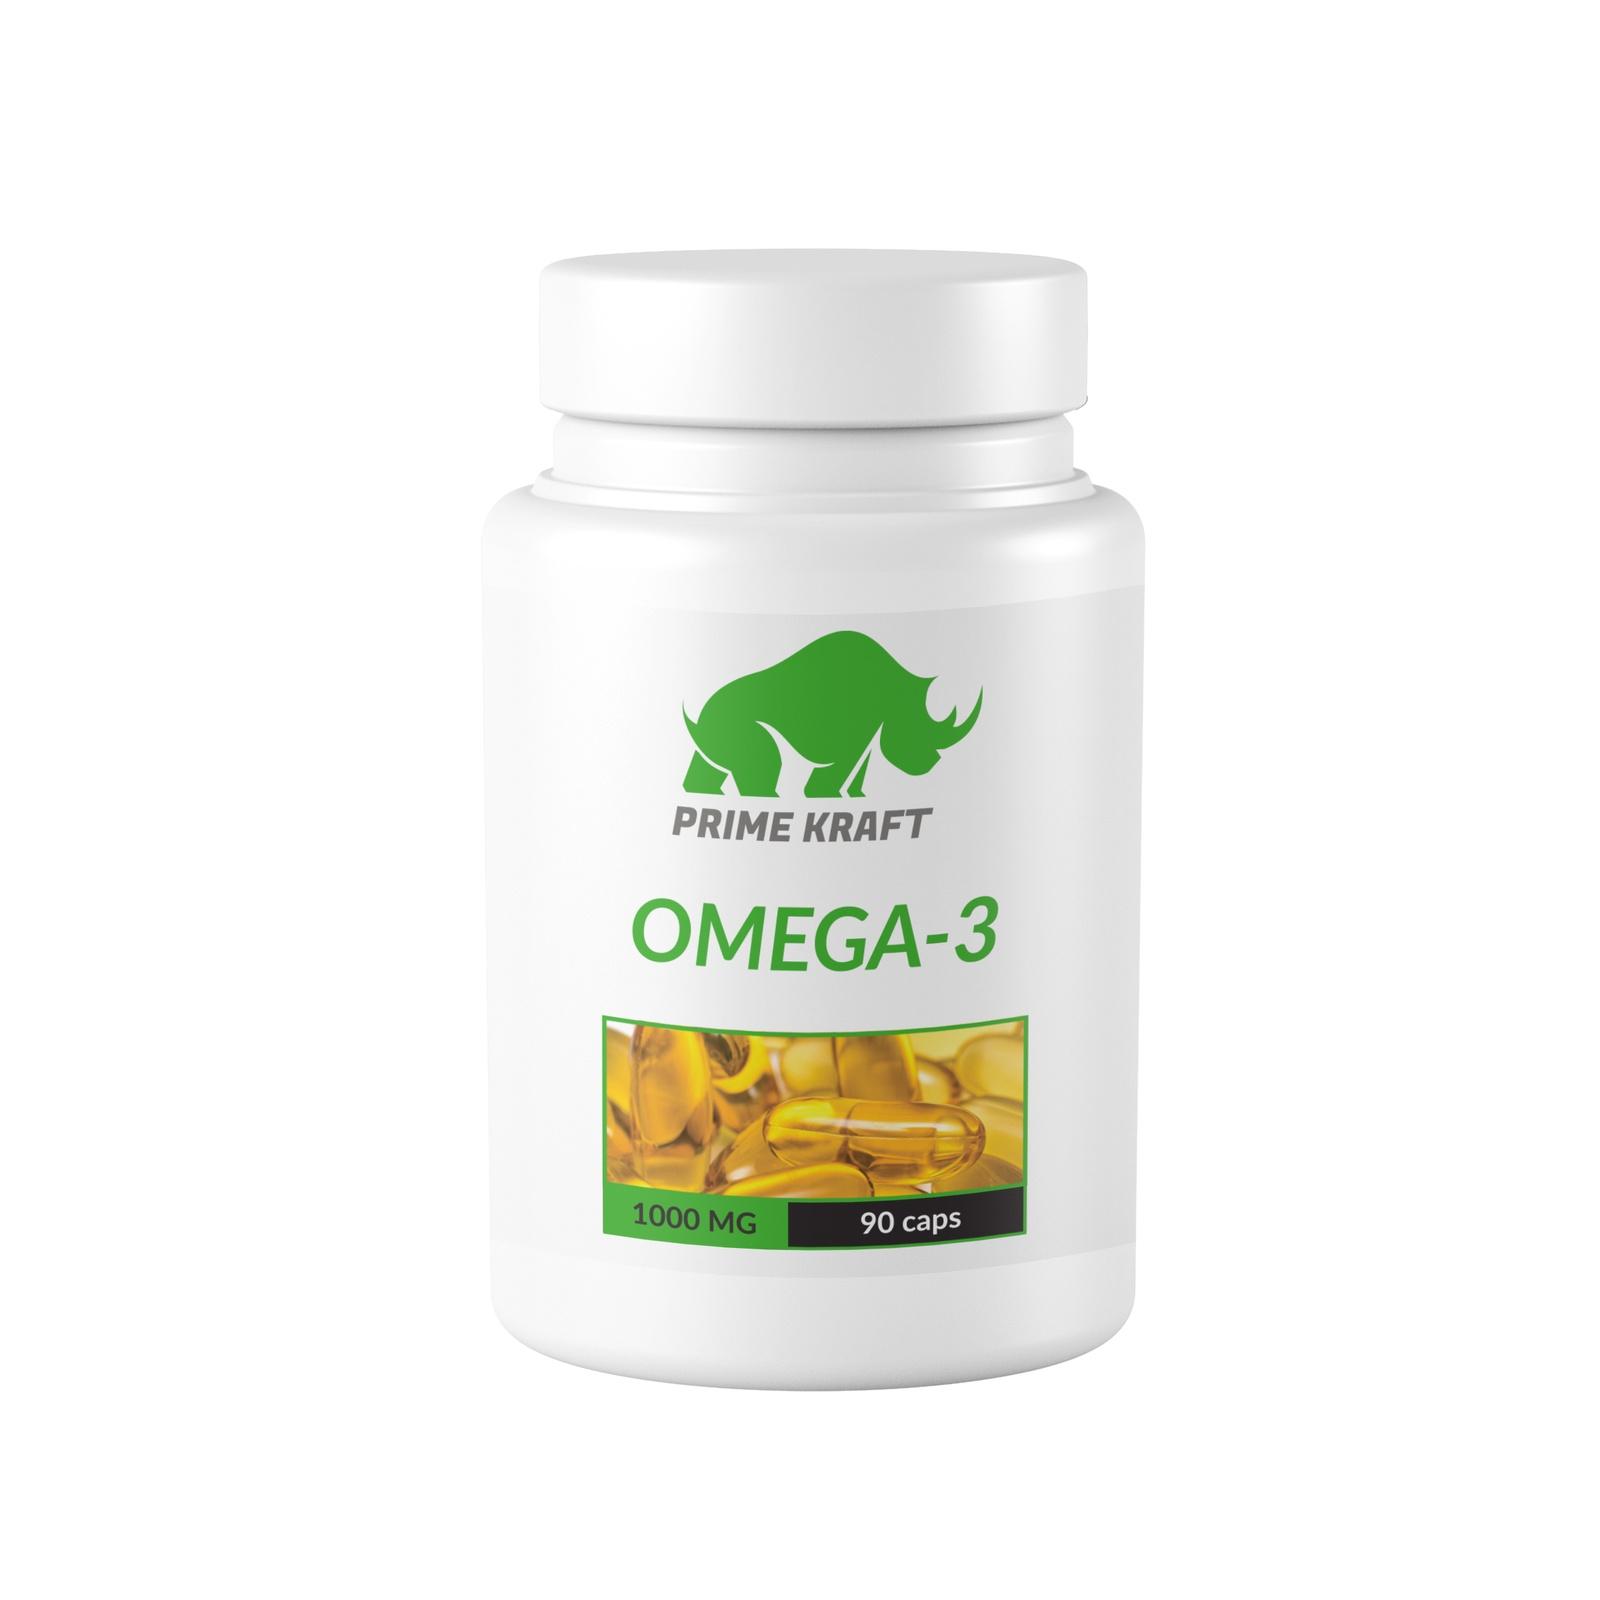 Omega 3 Prime Kraft OMEGA-3